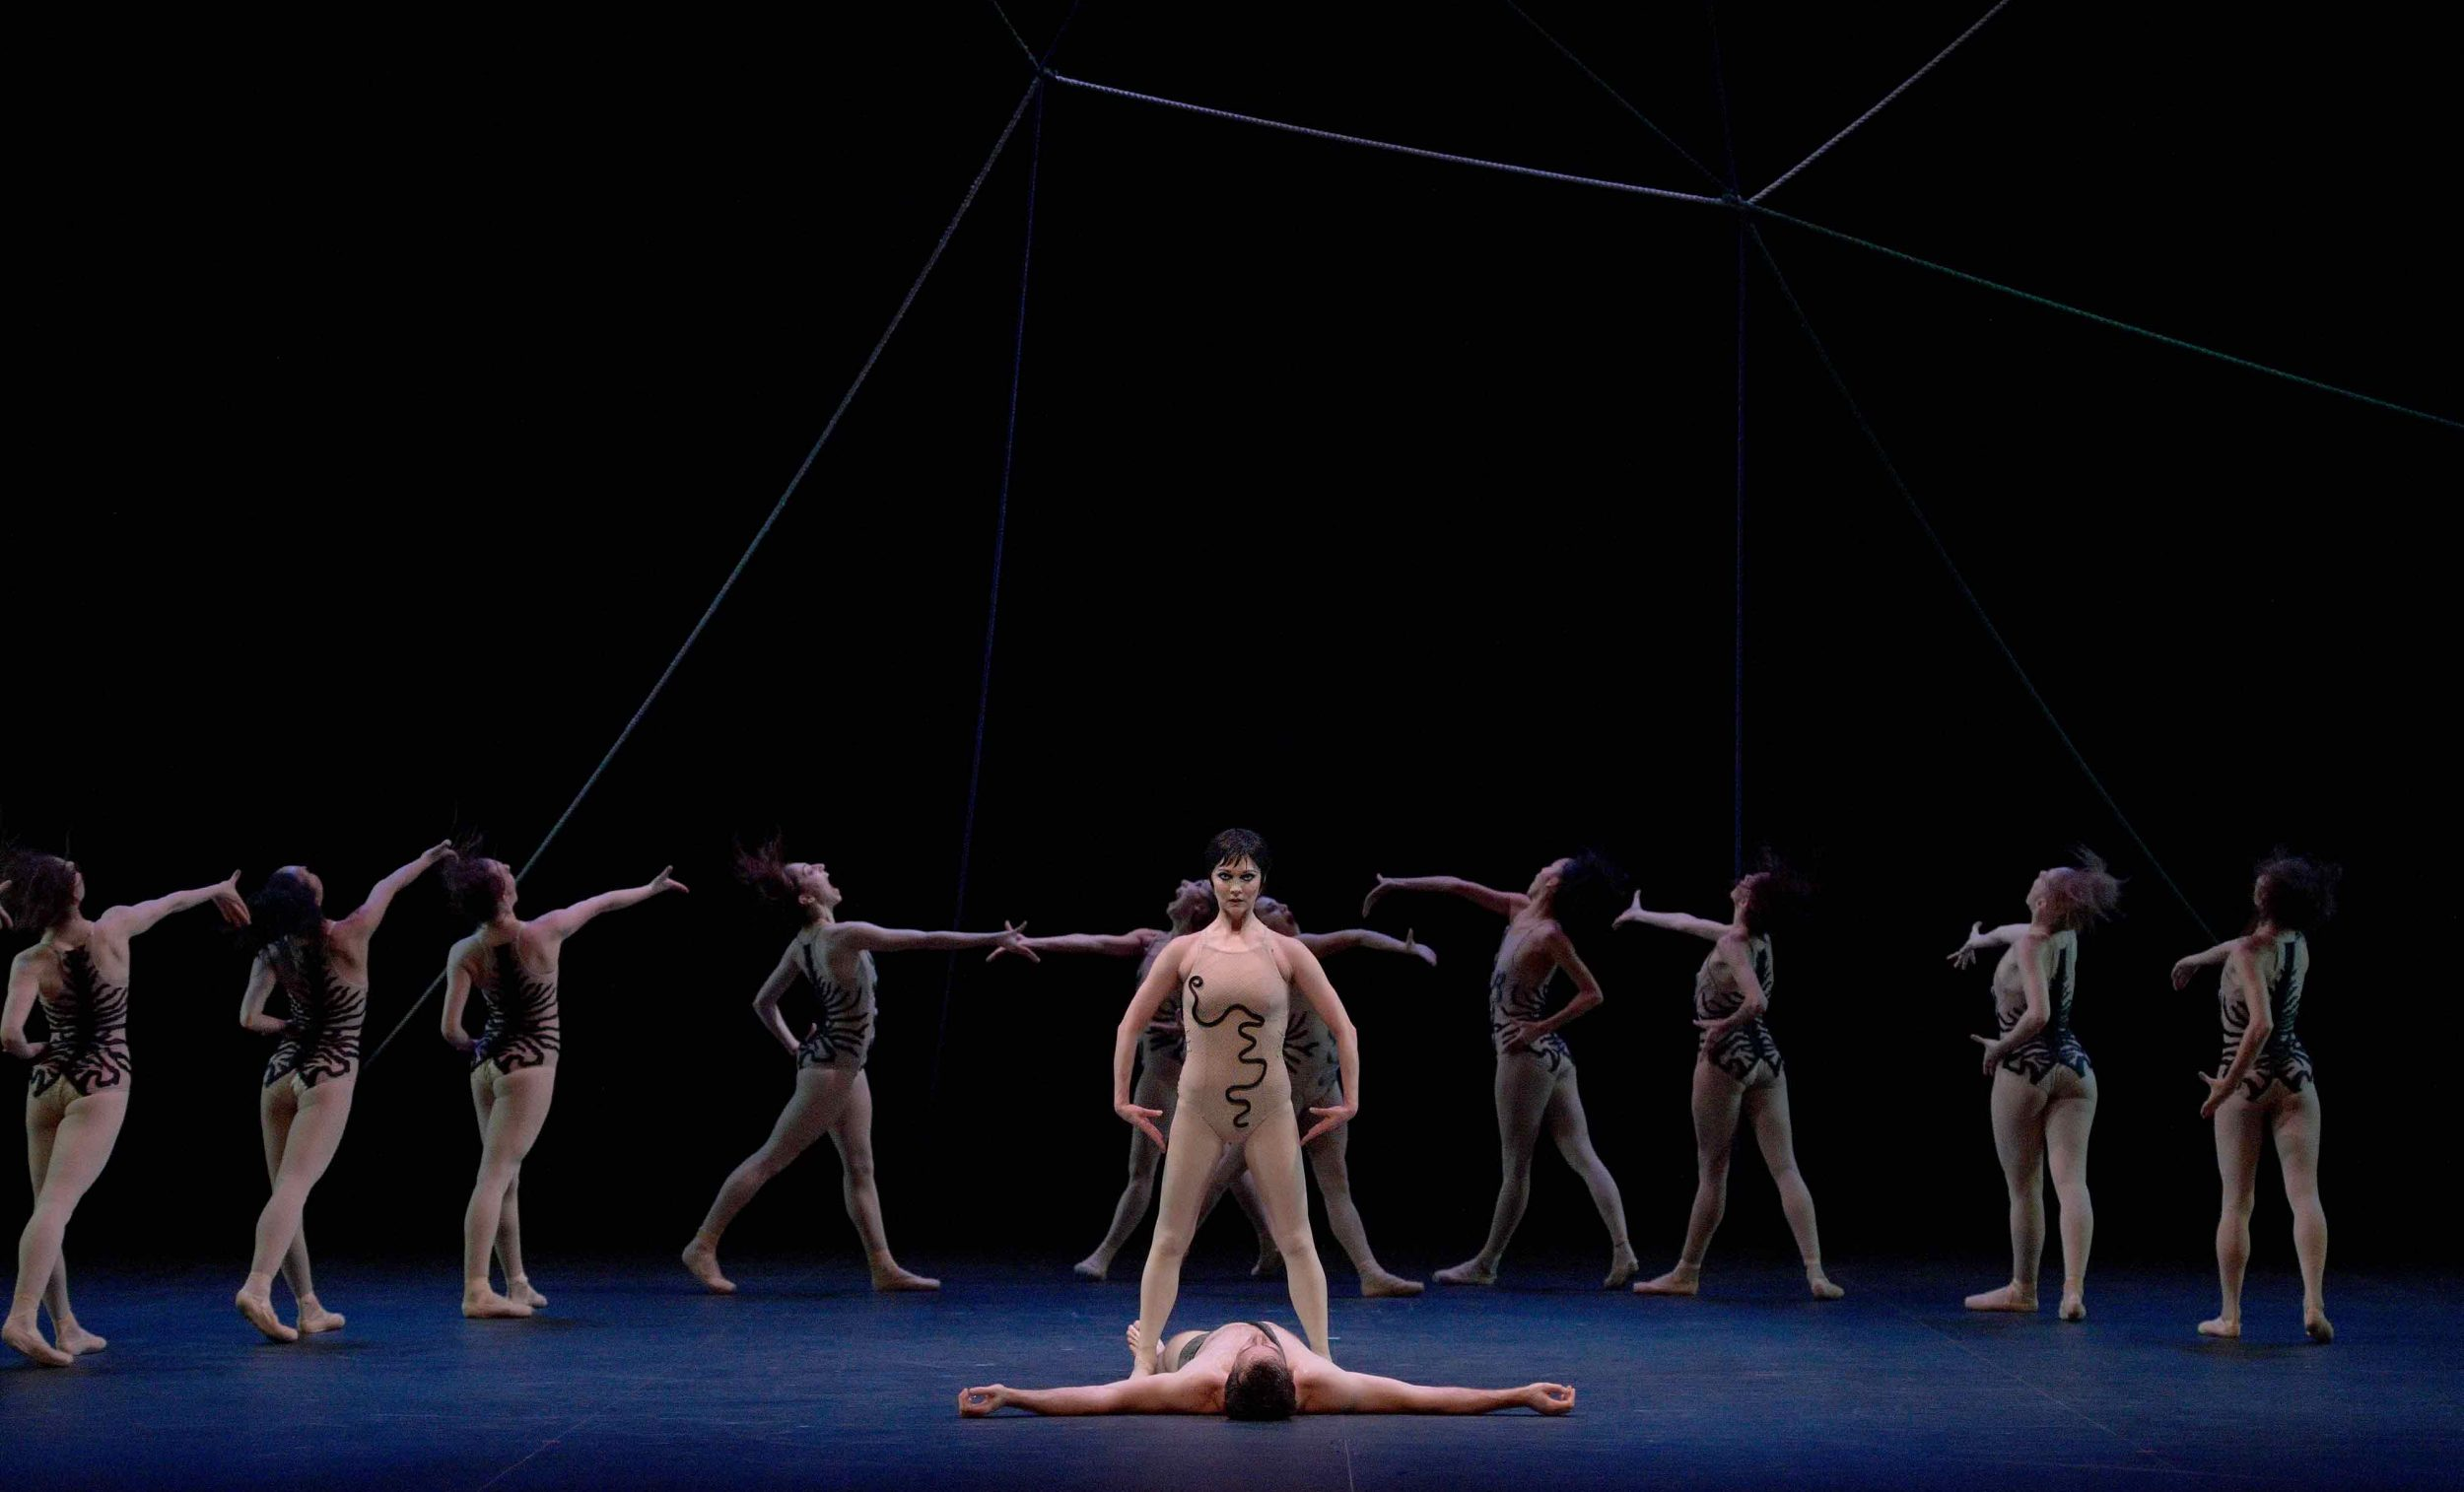 Jurgita-Dronina-in-The-Cage-by-Jerome-Robbins-©-Laurent-Liotardo-(2)